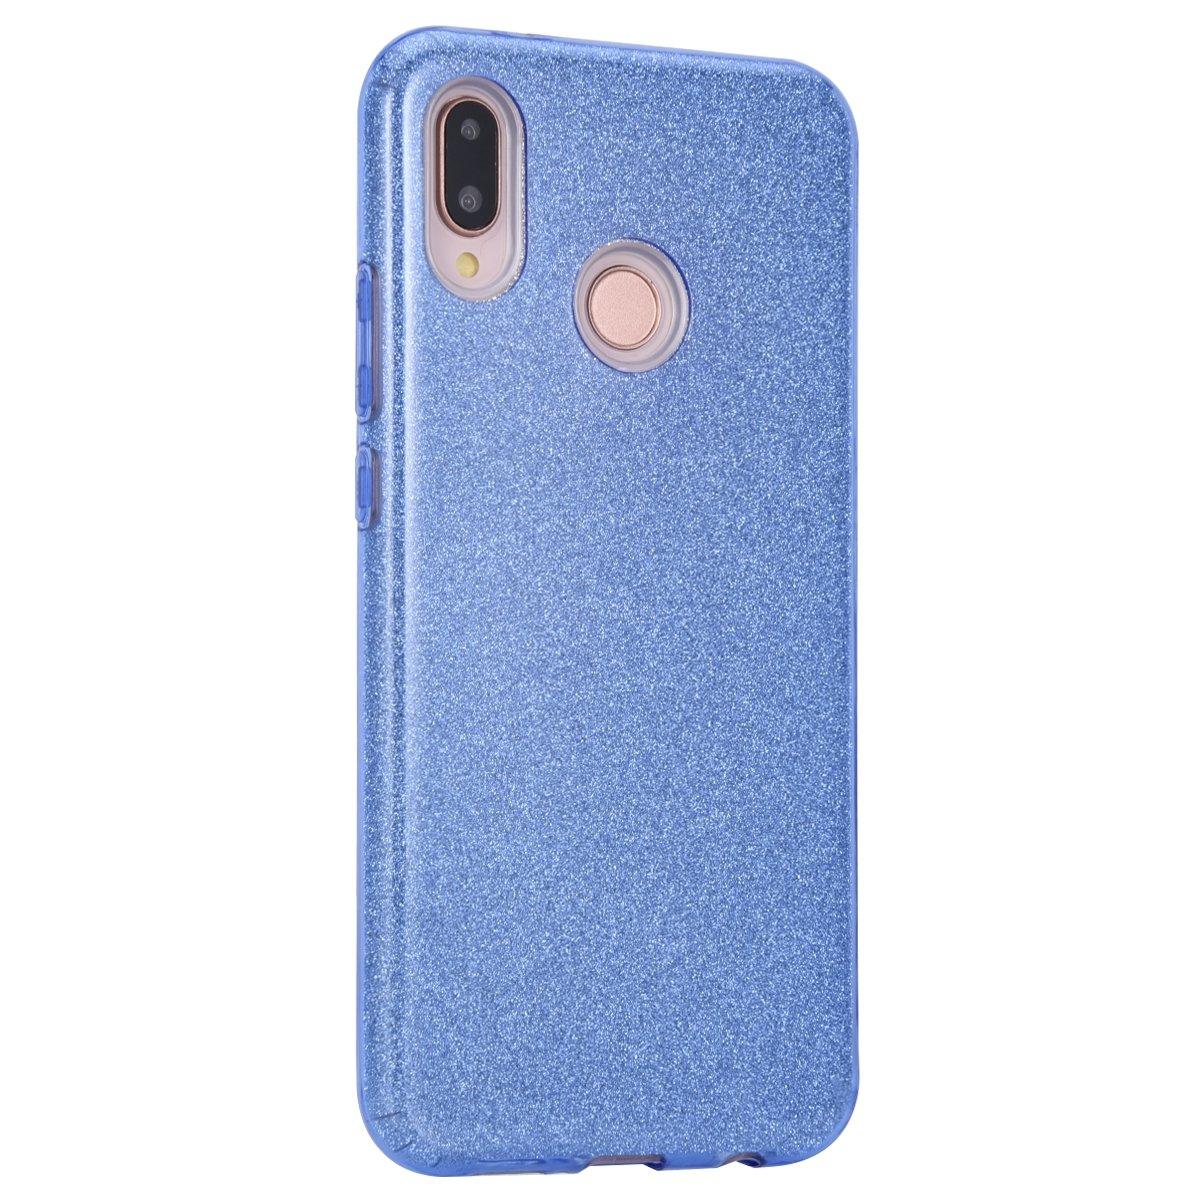 77a2b1b5a617 HandyHülle für Huawei P20 Lite, Huawei P20 Lite Glitzer Handy Tasche Hülle,  Uposao Kristall